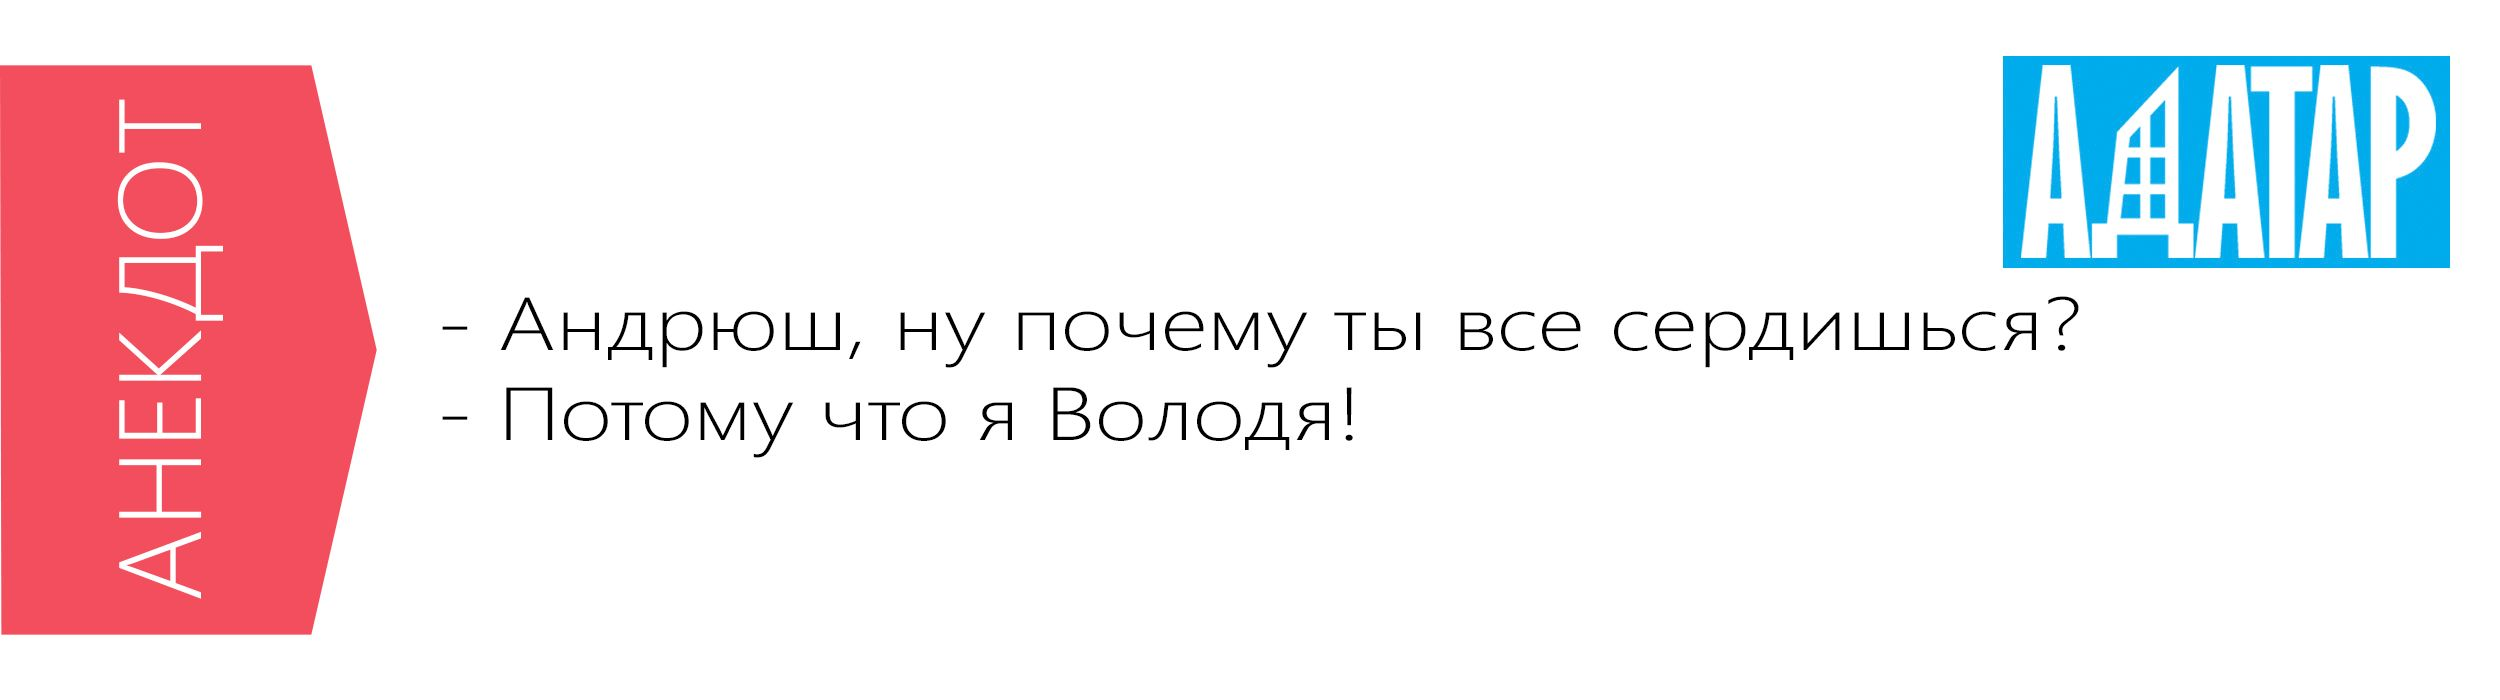 АНЕКДОТ 51.jpg